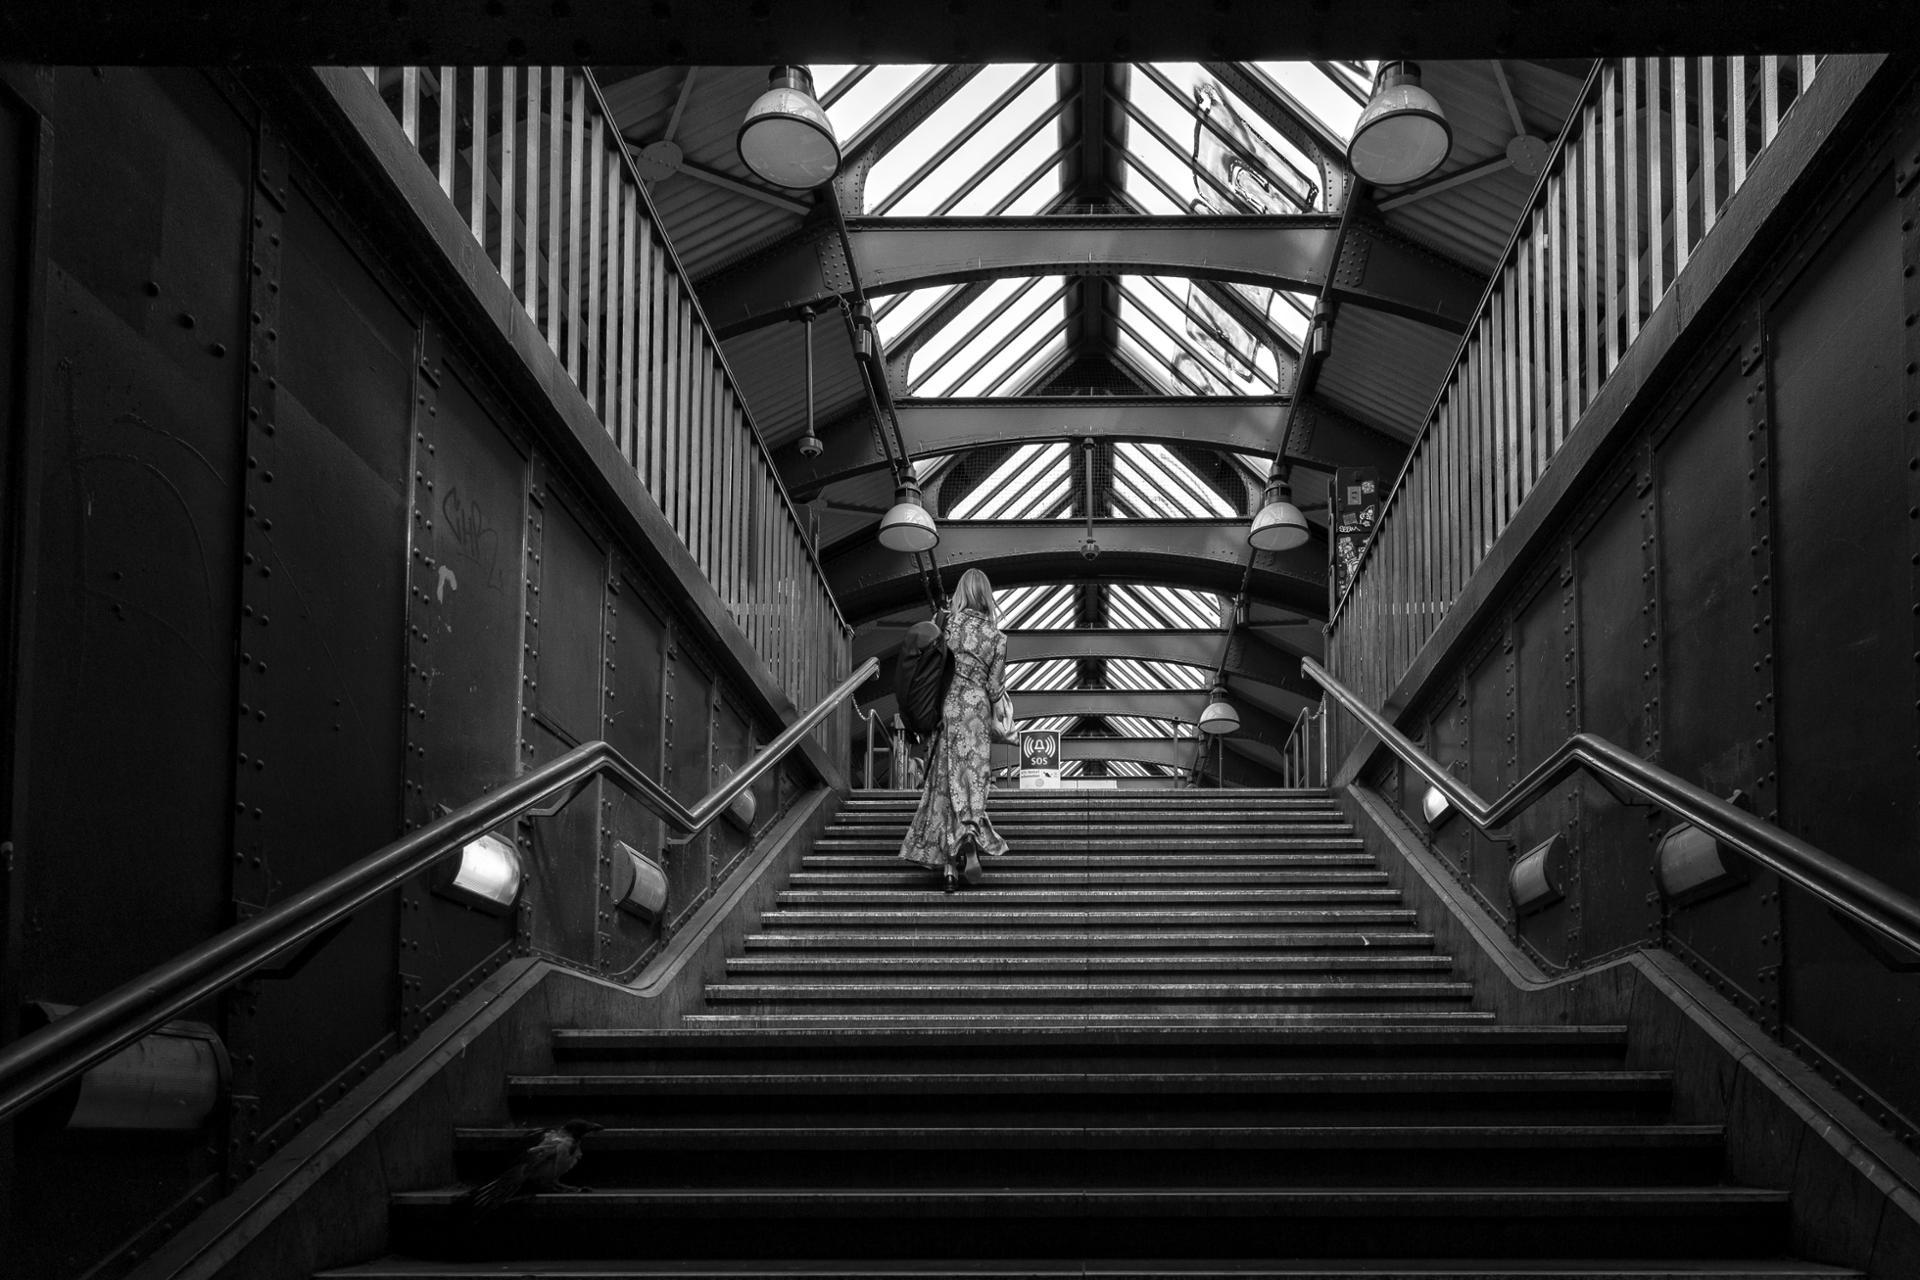 La demoiselle du métro